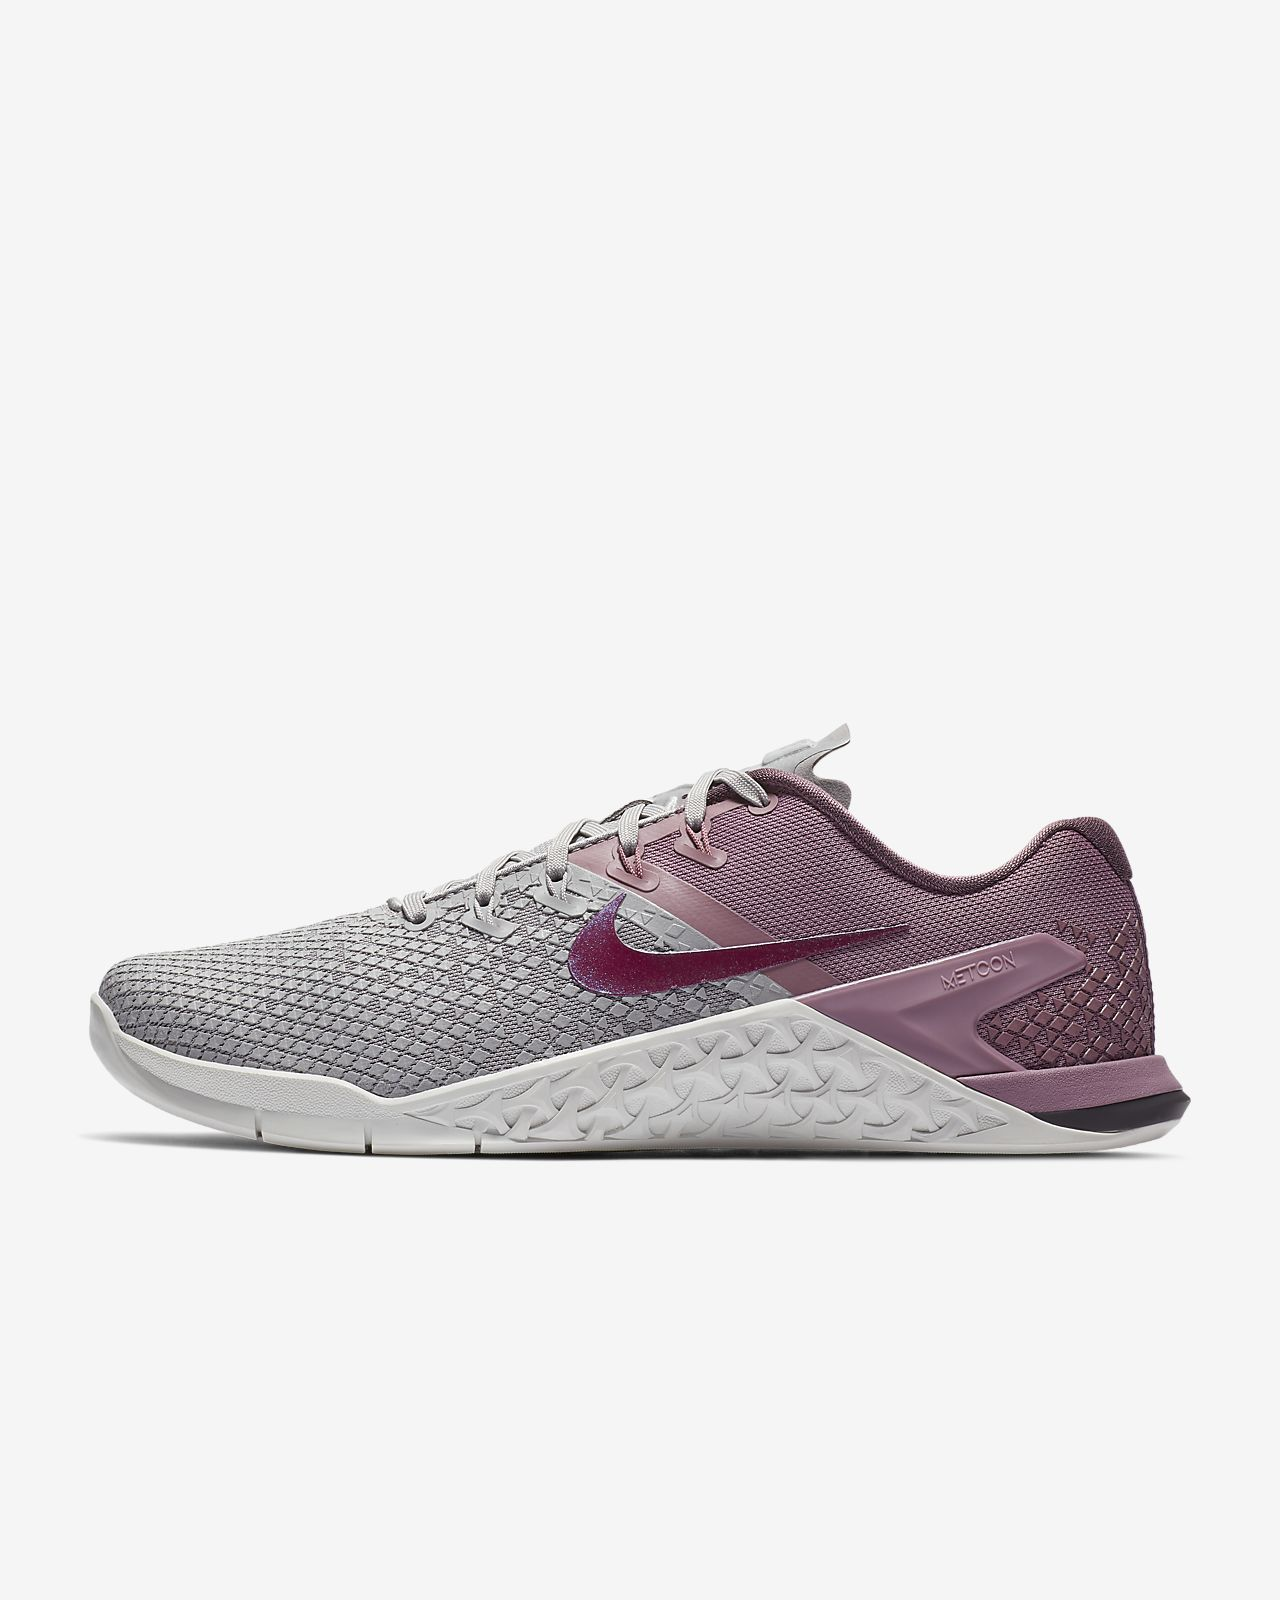 low priced 9f0c6 e069d Nike Metcon 4 XD